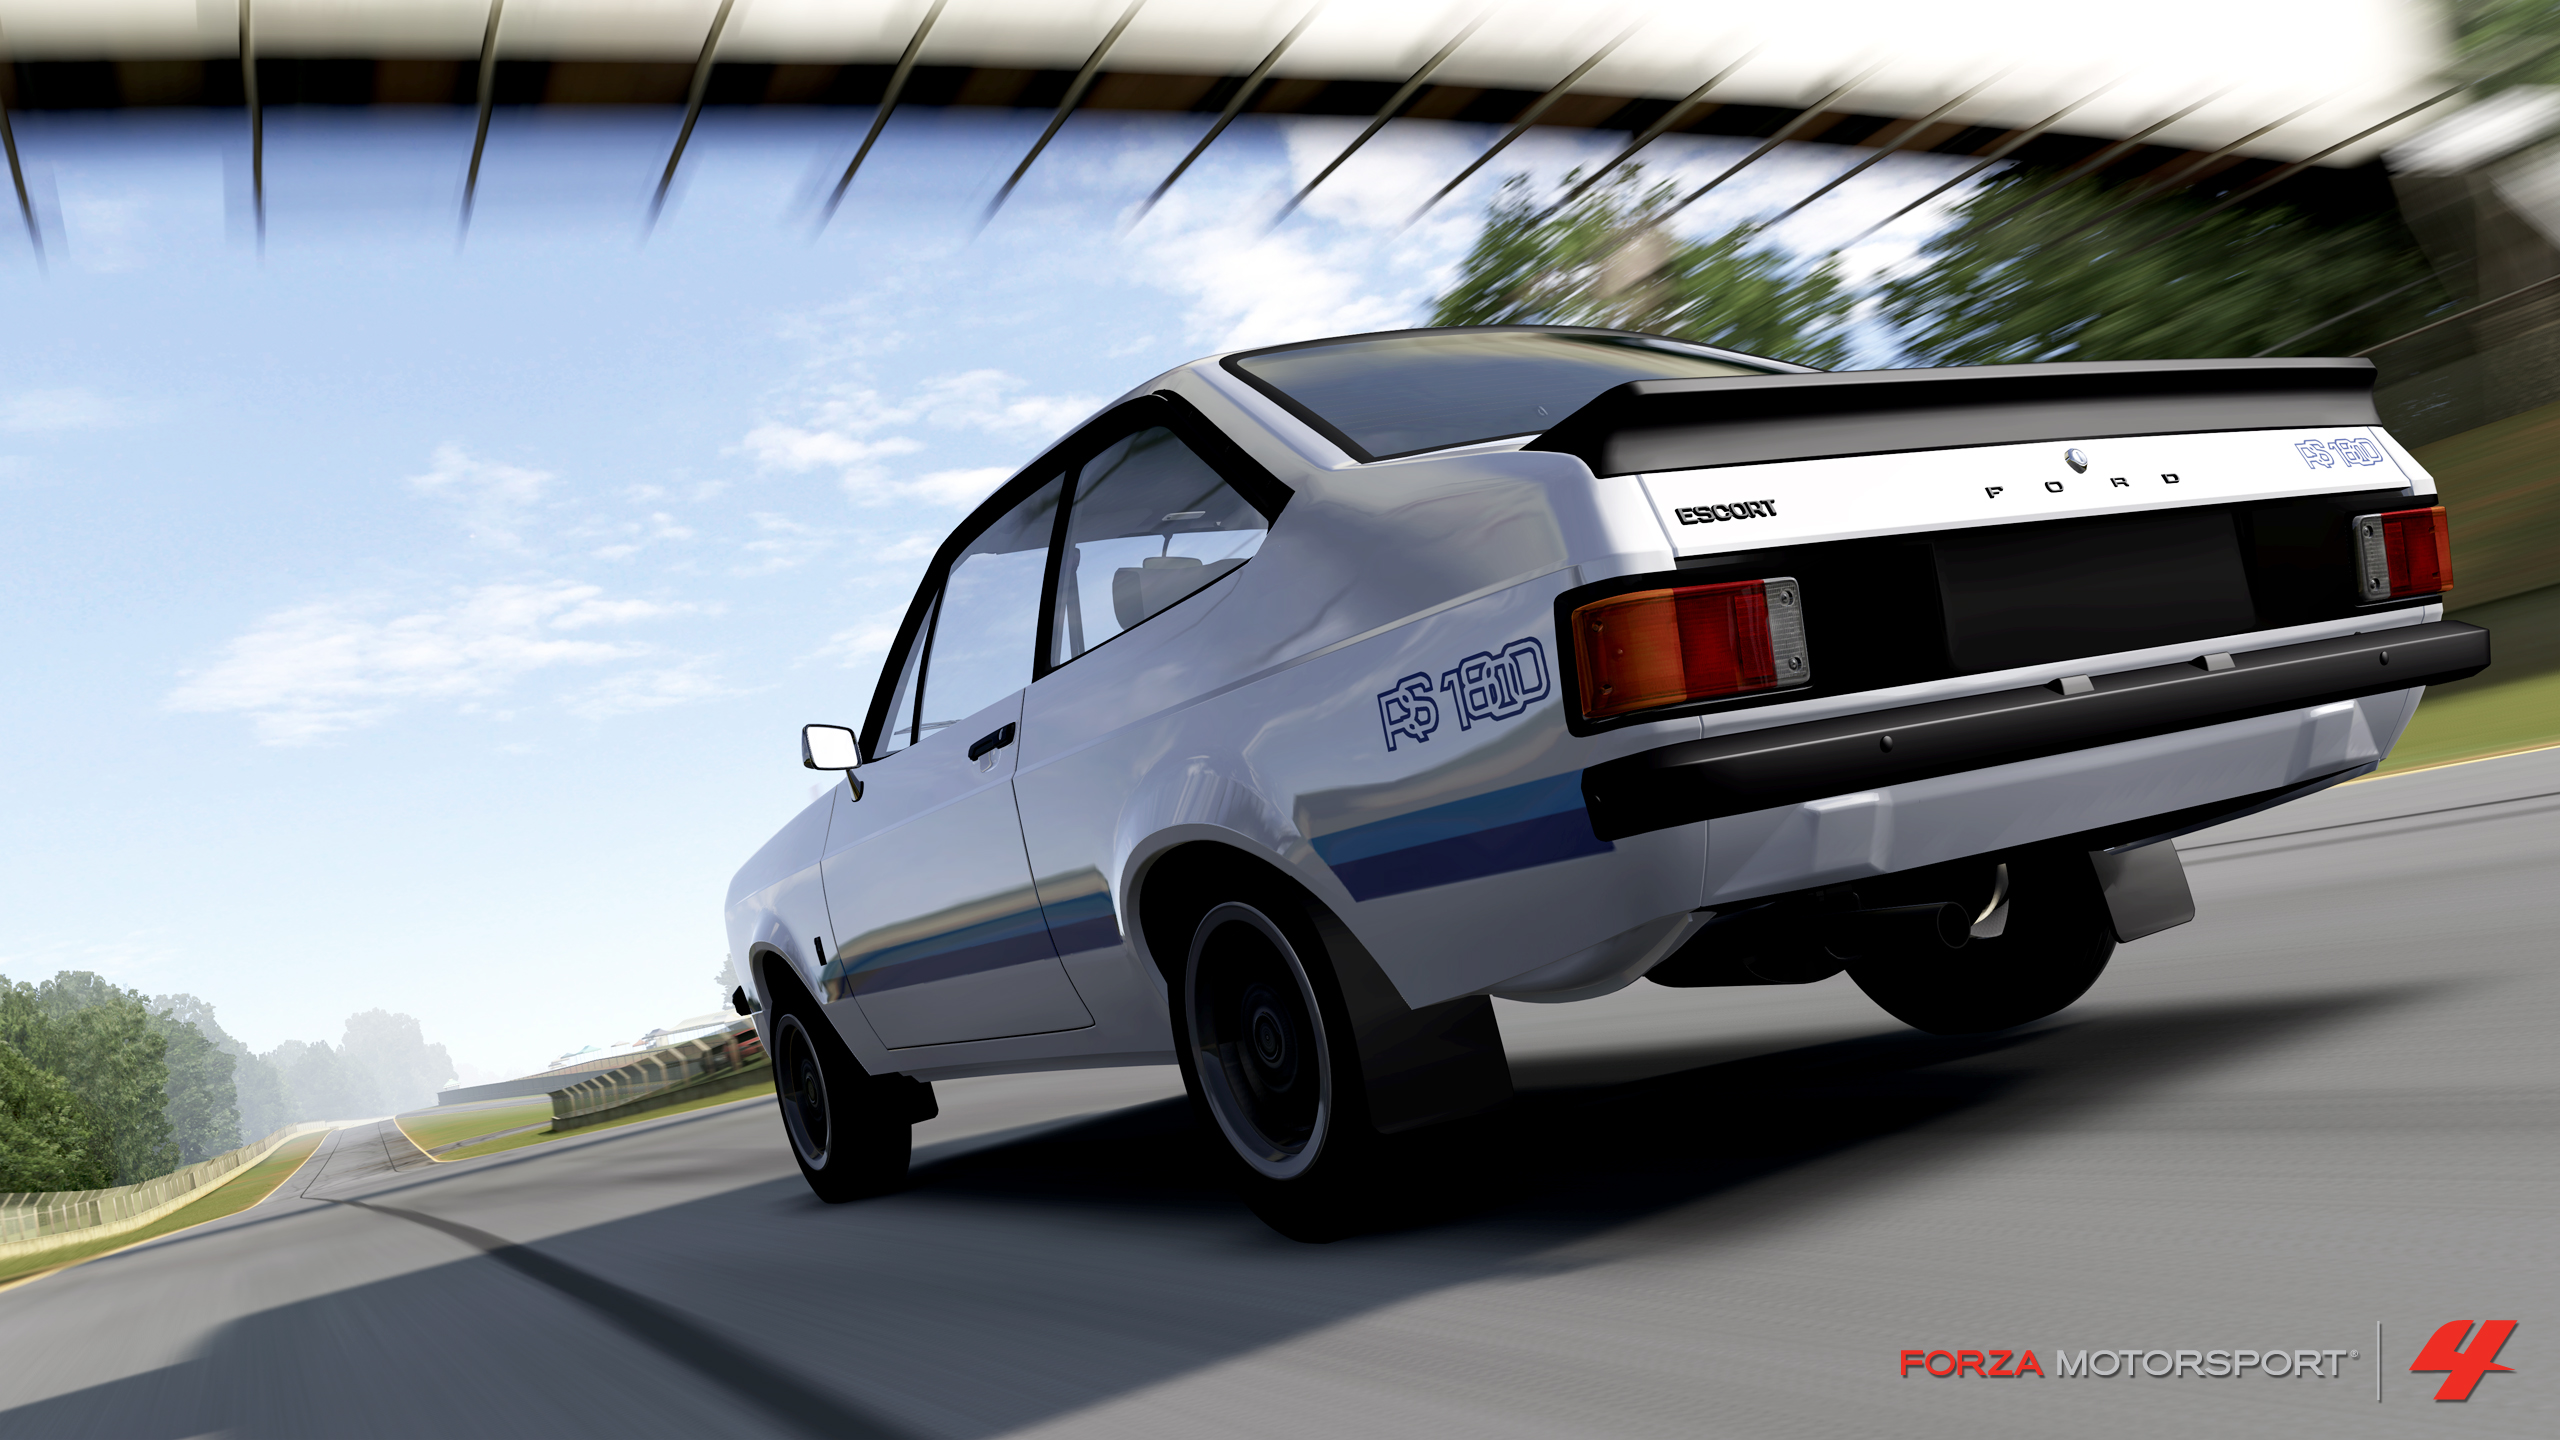 image fm4 ford escort 77 3 jpg forza motorsport wiki fandom